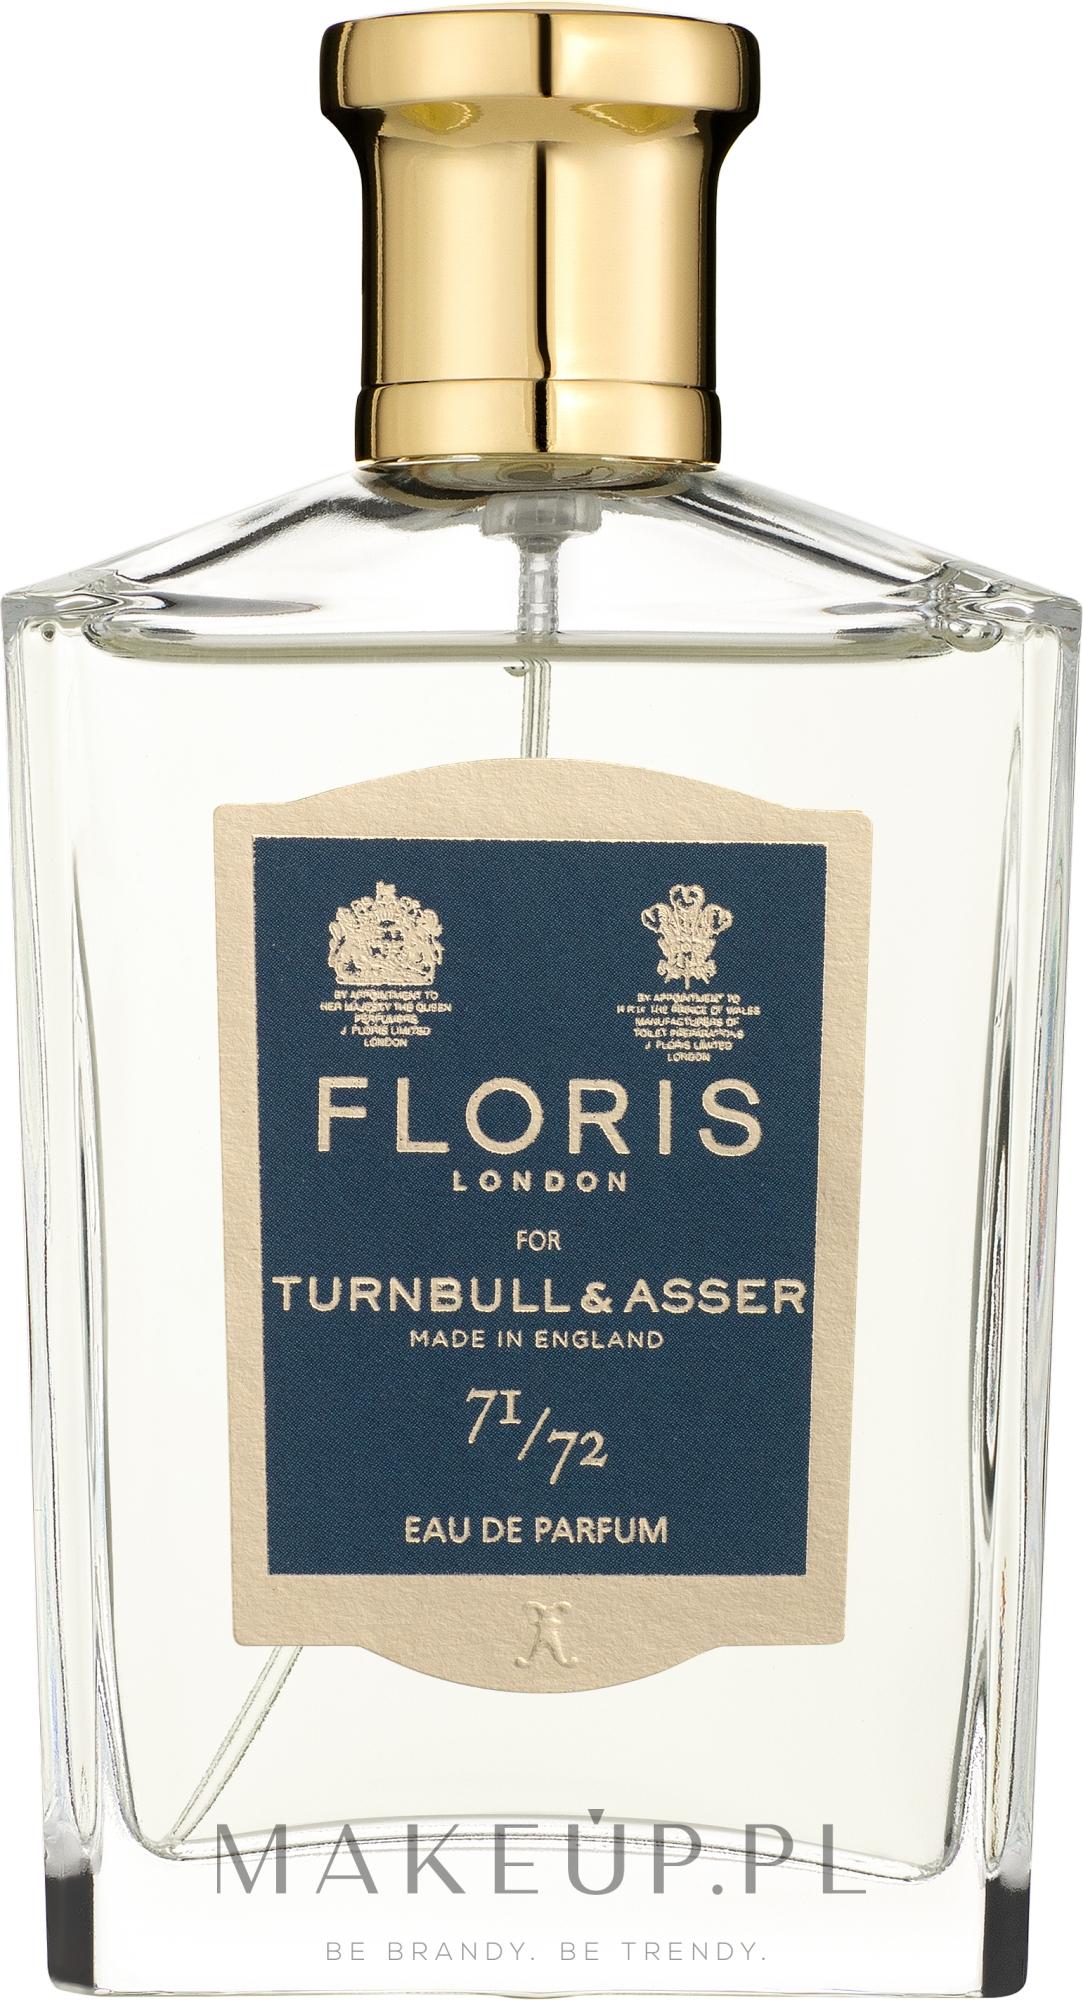 floris turnbull & asser - 71/72